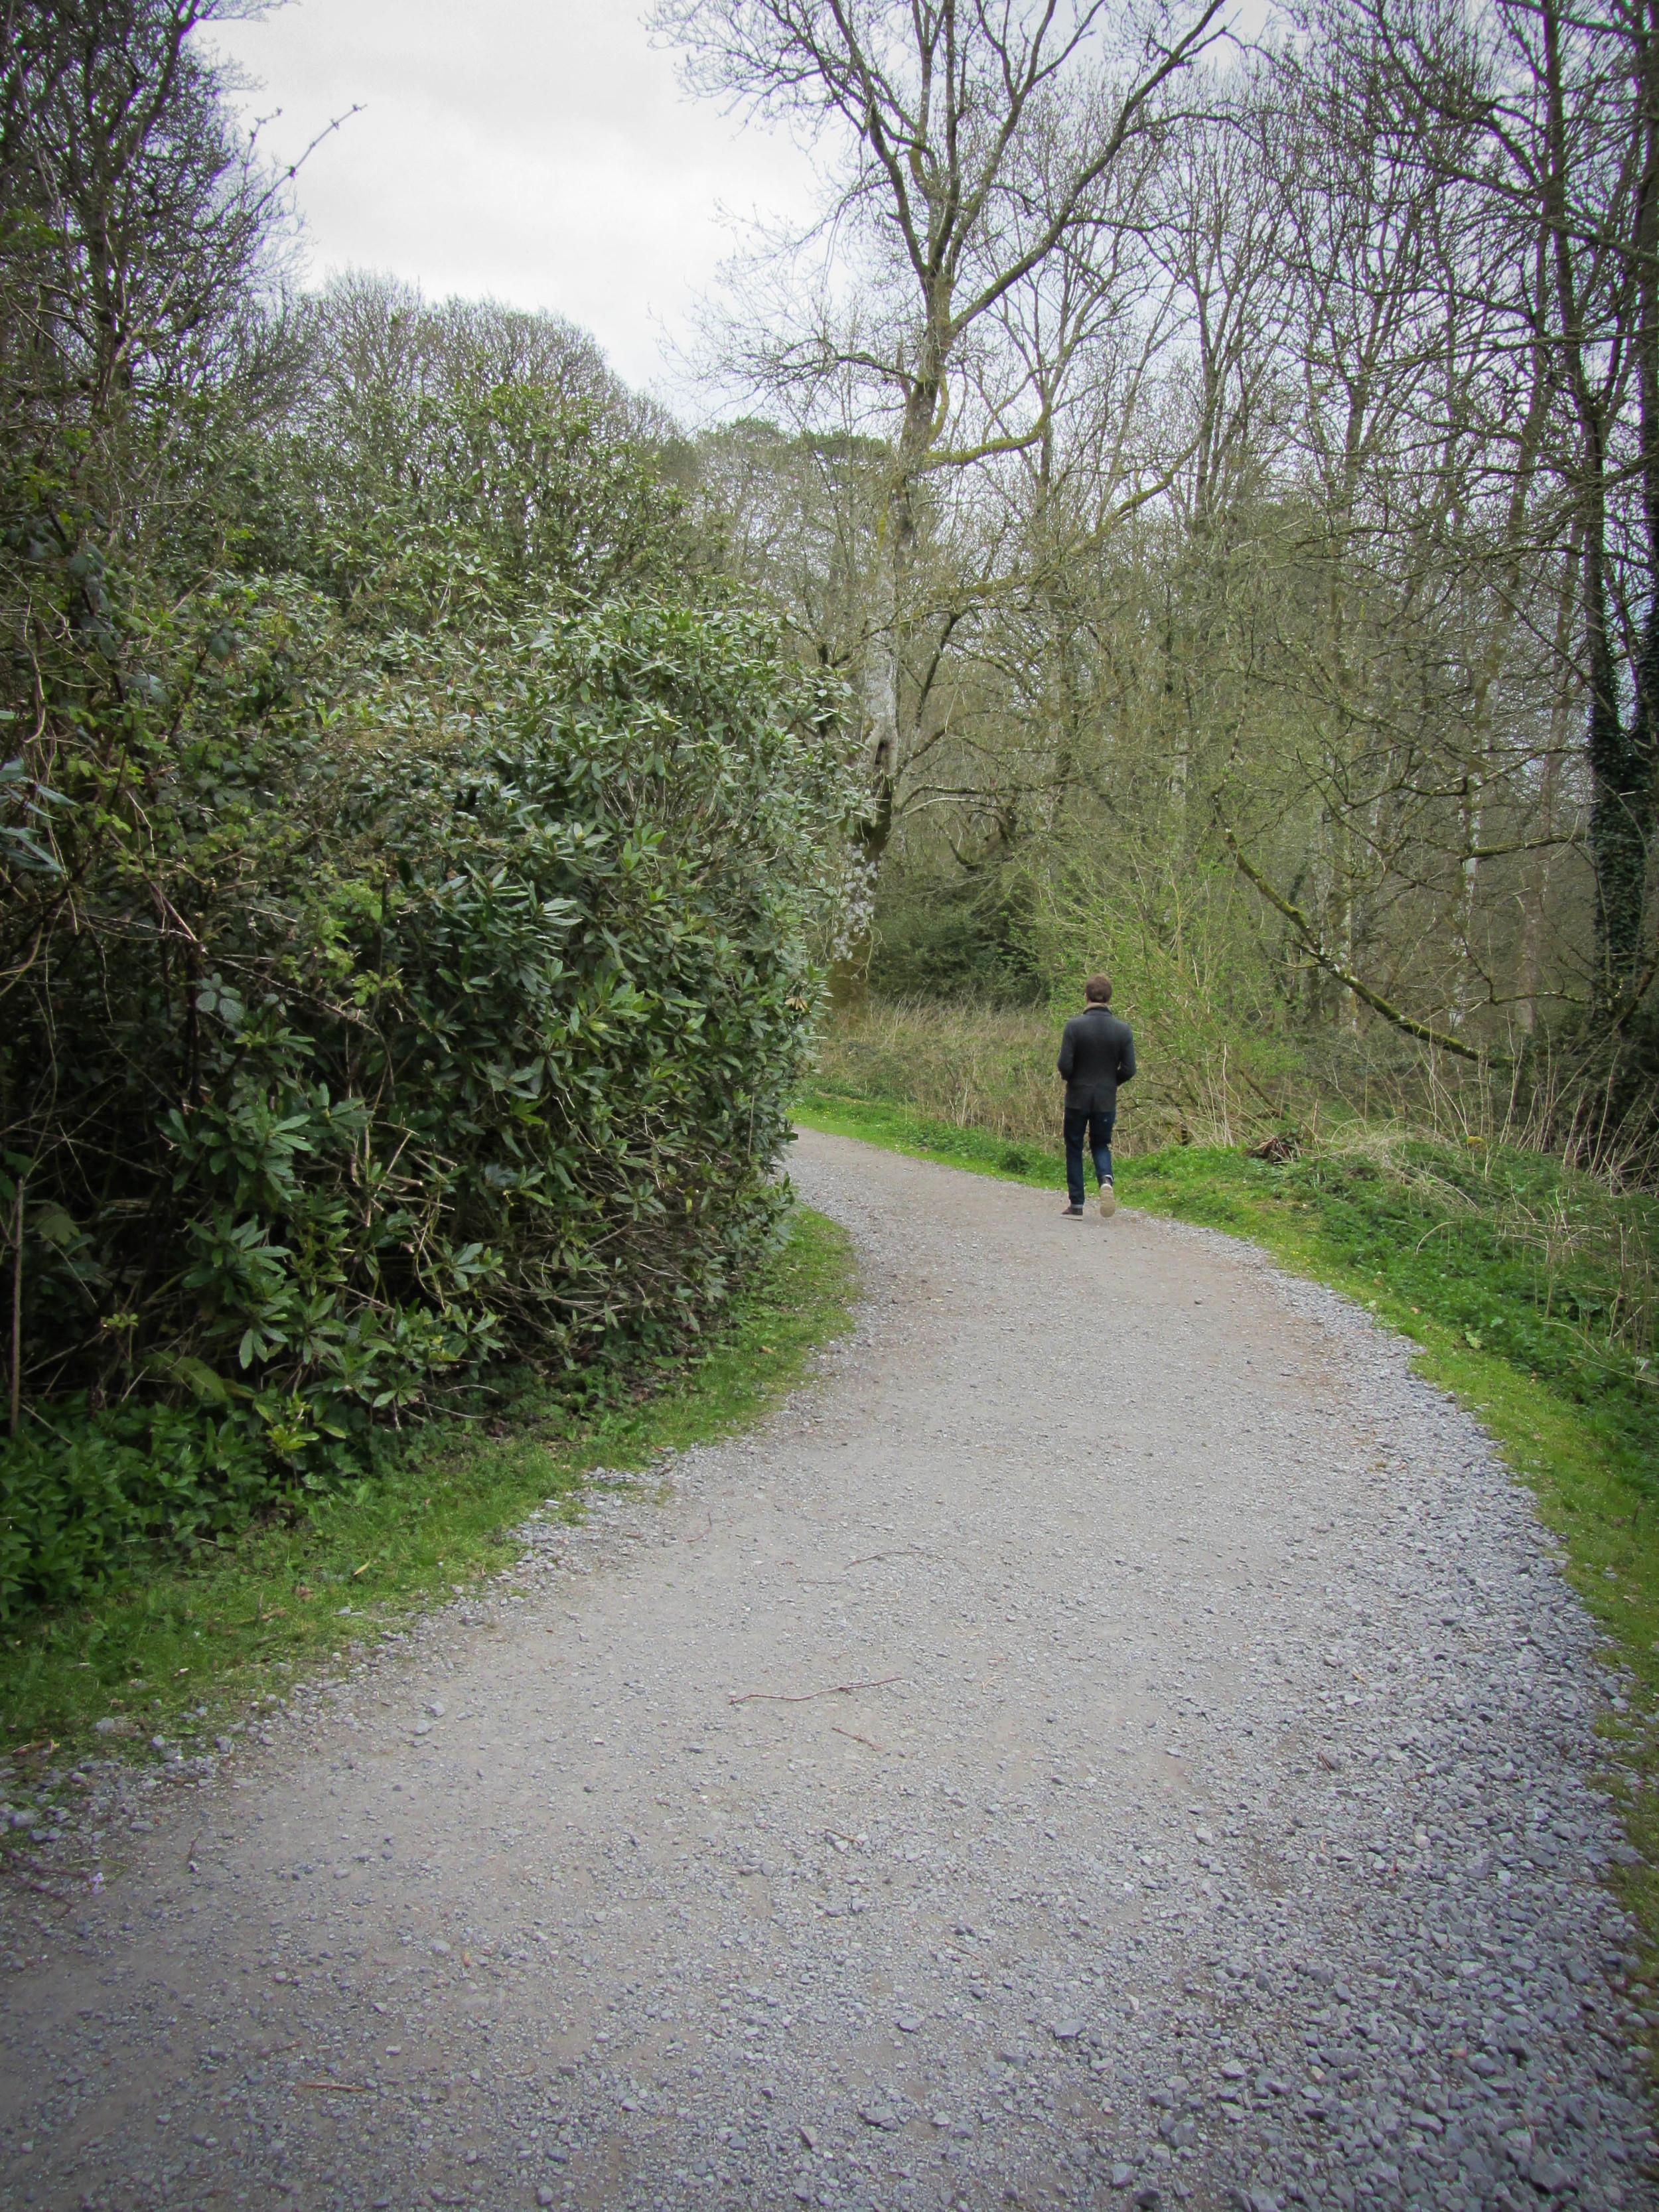 Strolling down